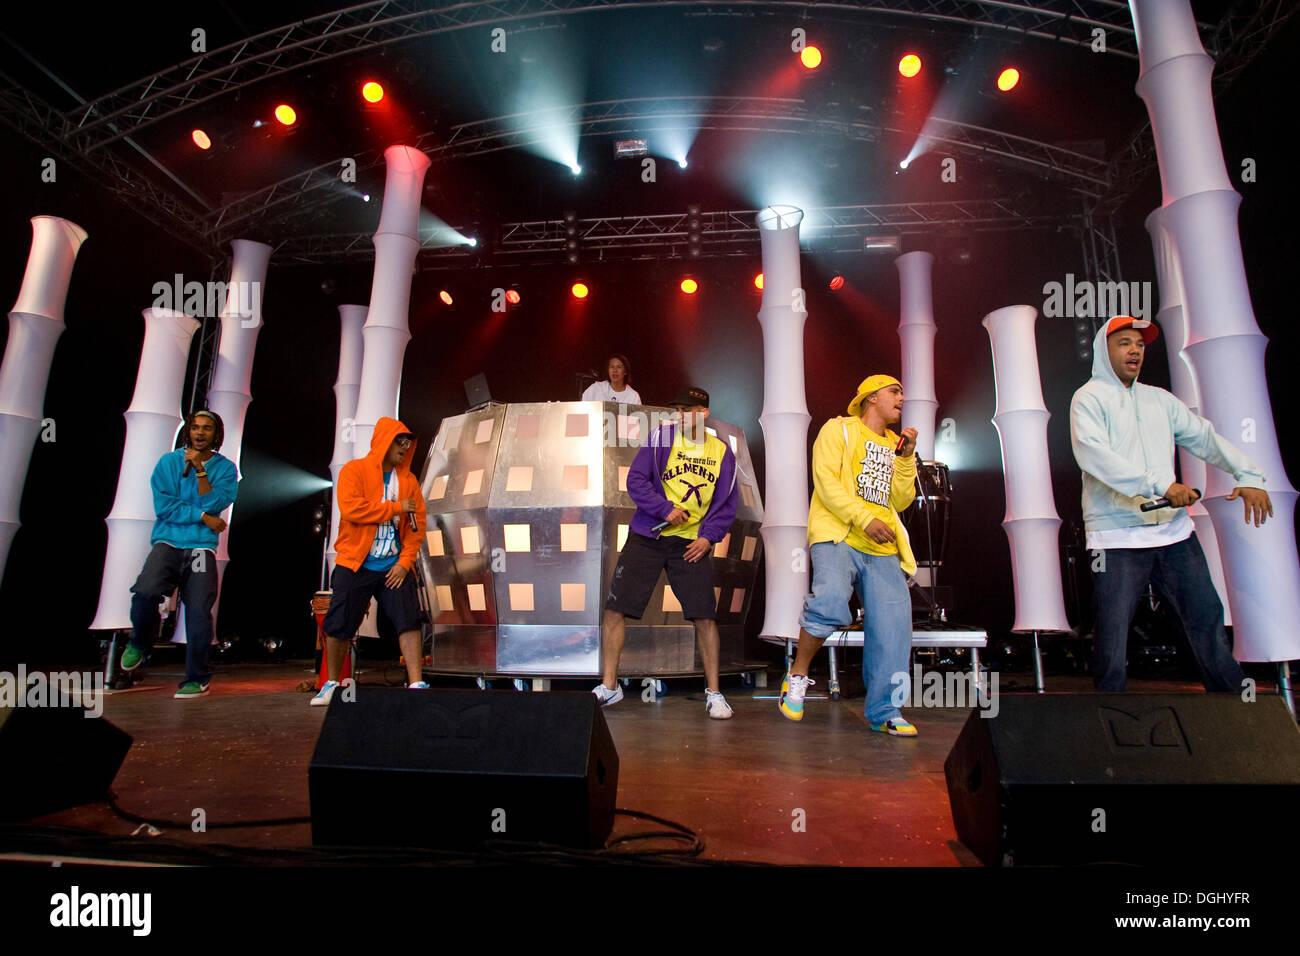 German pop-reggae band Culcha Candela live at the Heitere Open Air in Zofingen, Switzerland - Stock Image